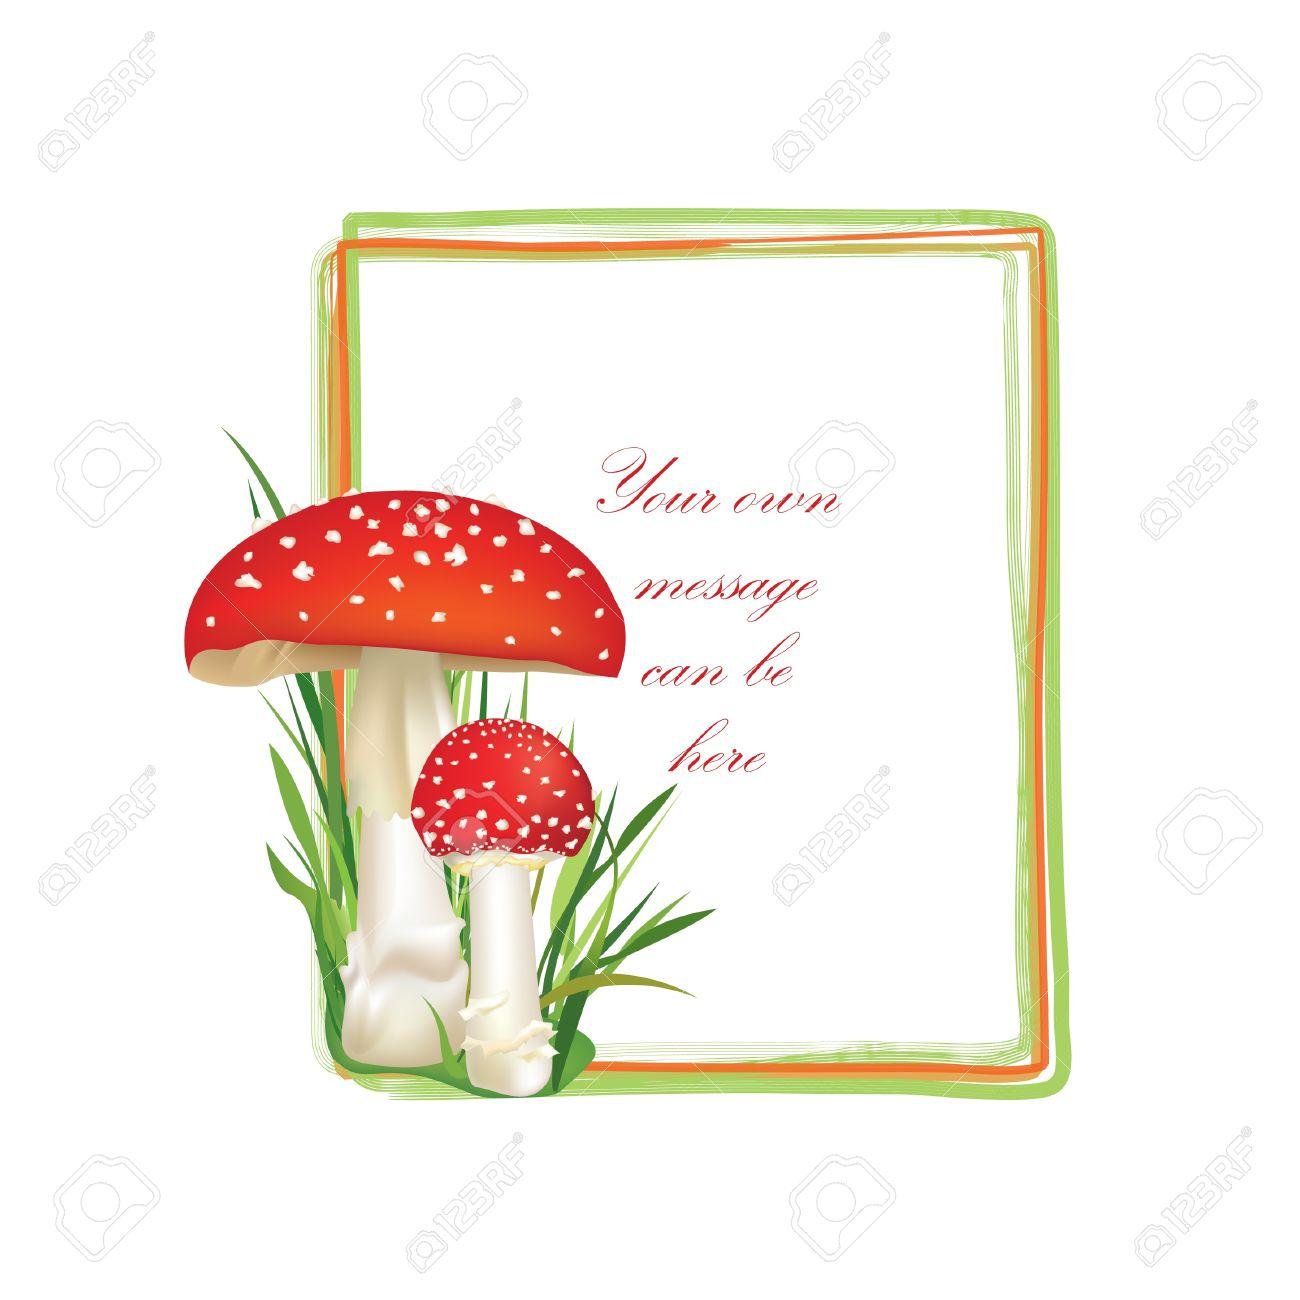 Summer Forest Frame Rectangle Shape Red Poison Mushroom Isolated.